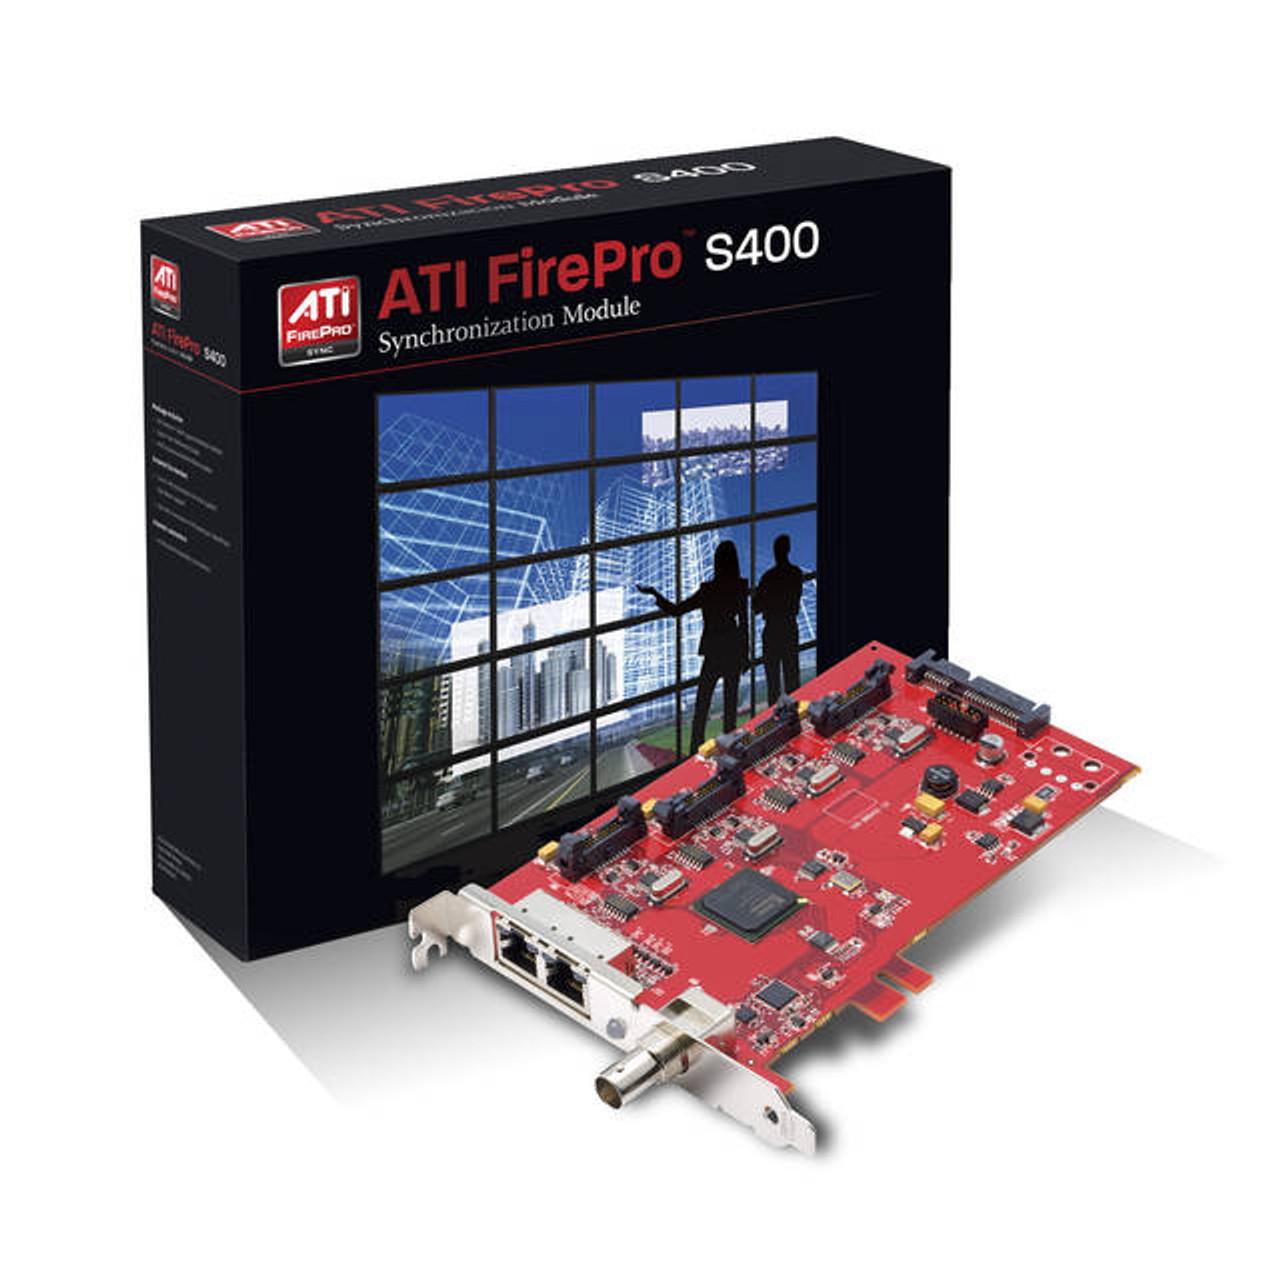 100 505981 Amd Firepro S400 Synchronization Module